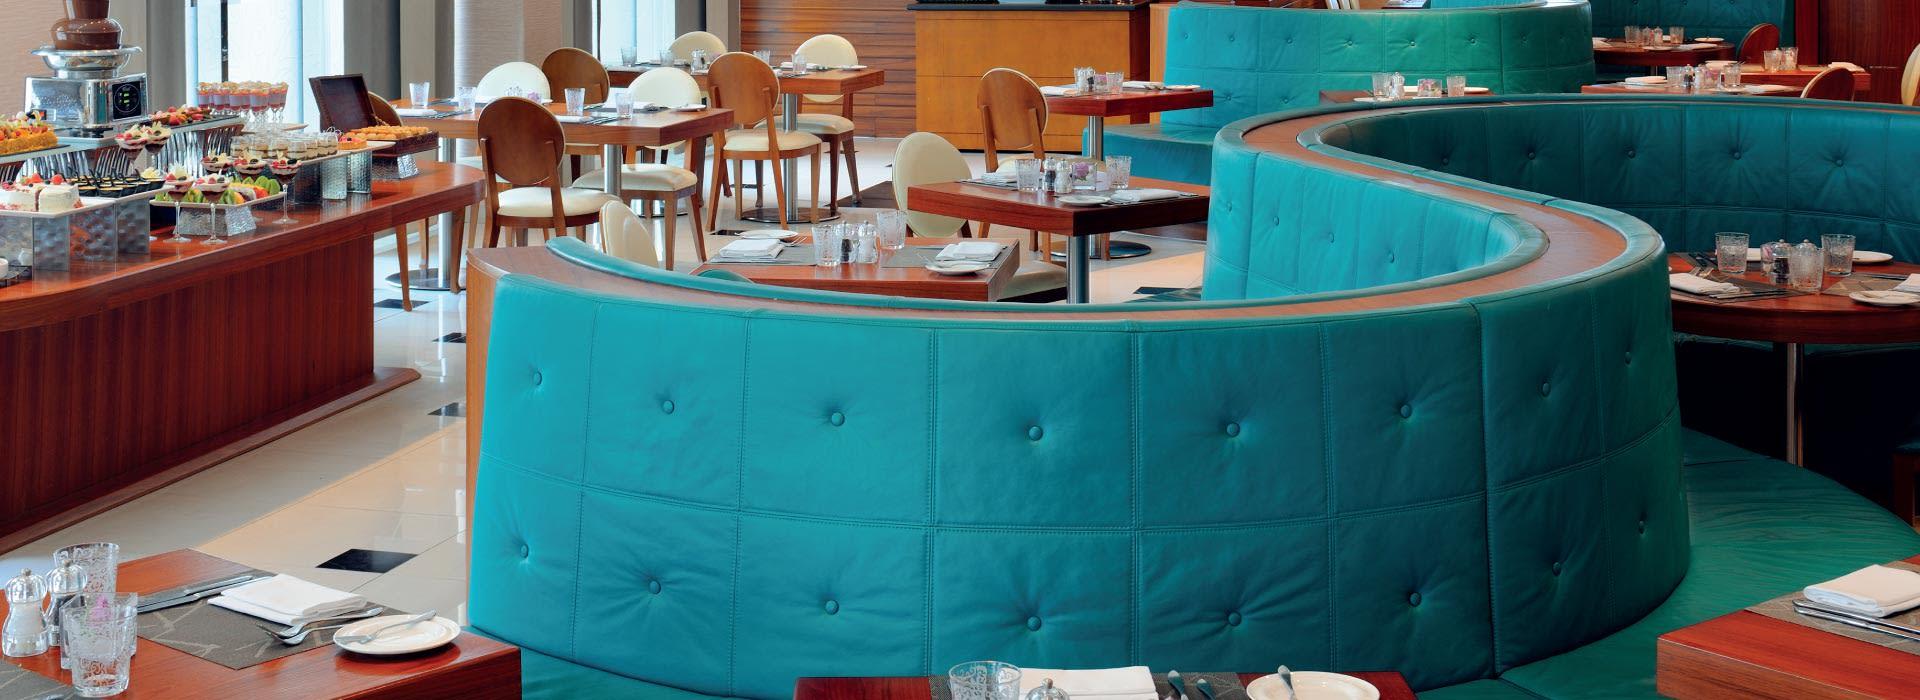 Jigsaw is among best Restaurants in Deira